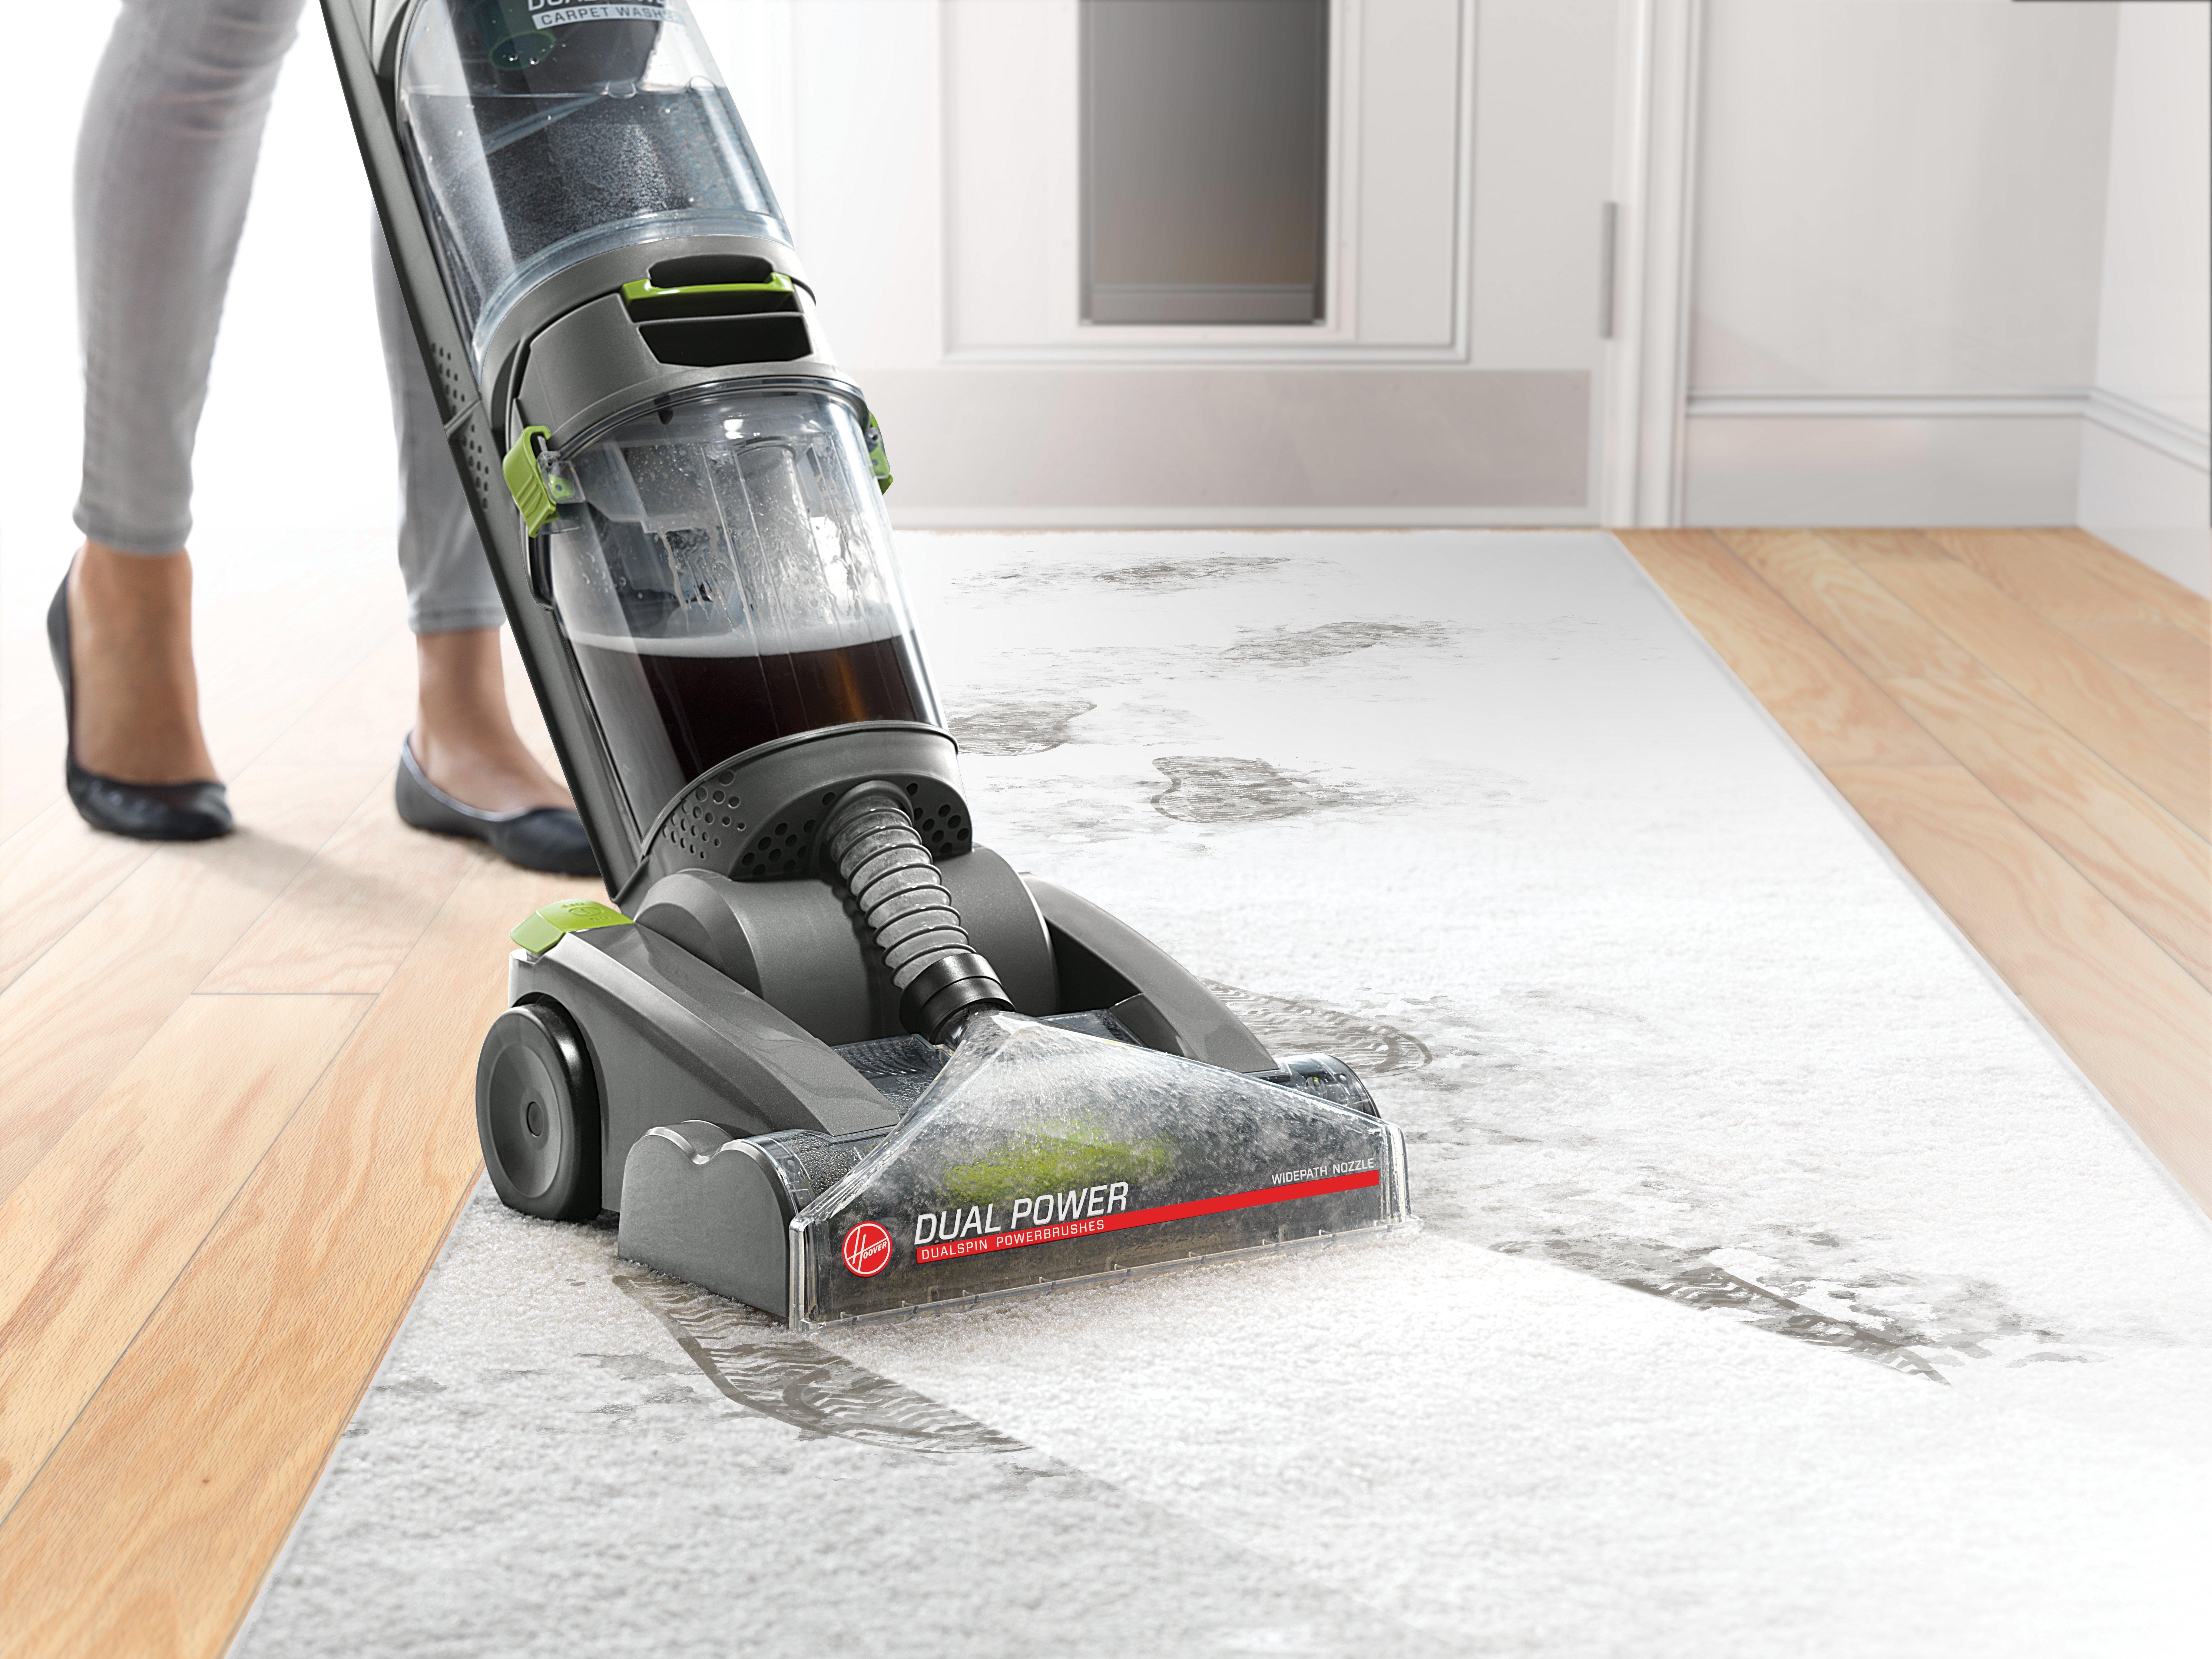 Dual Power Carpet Washer5